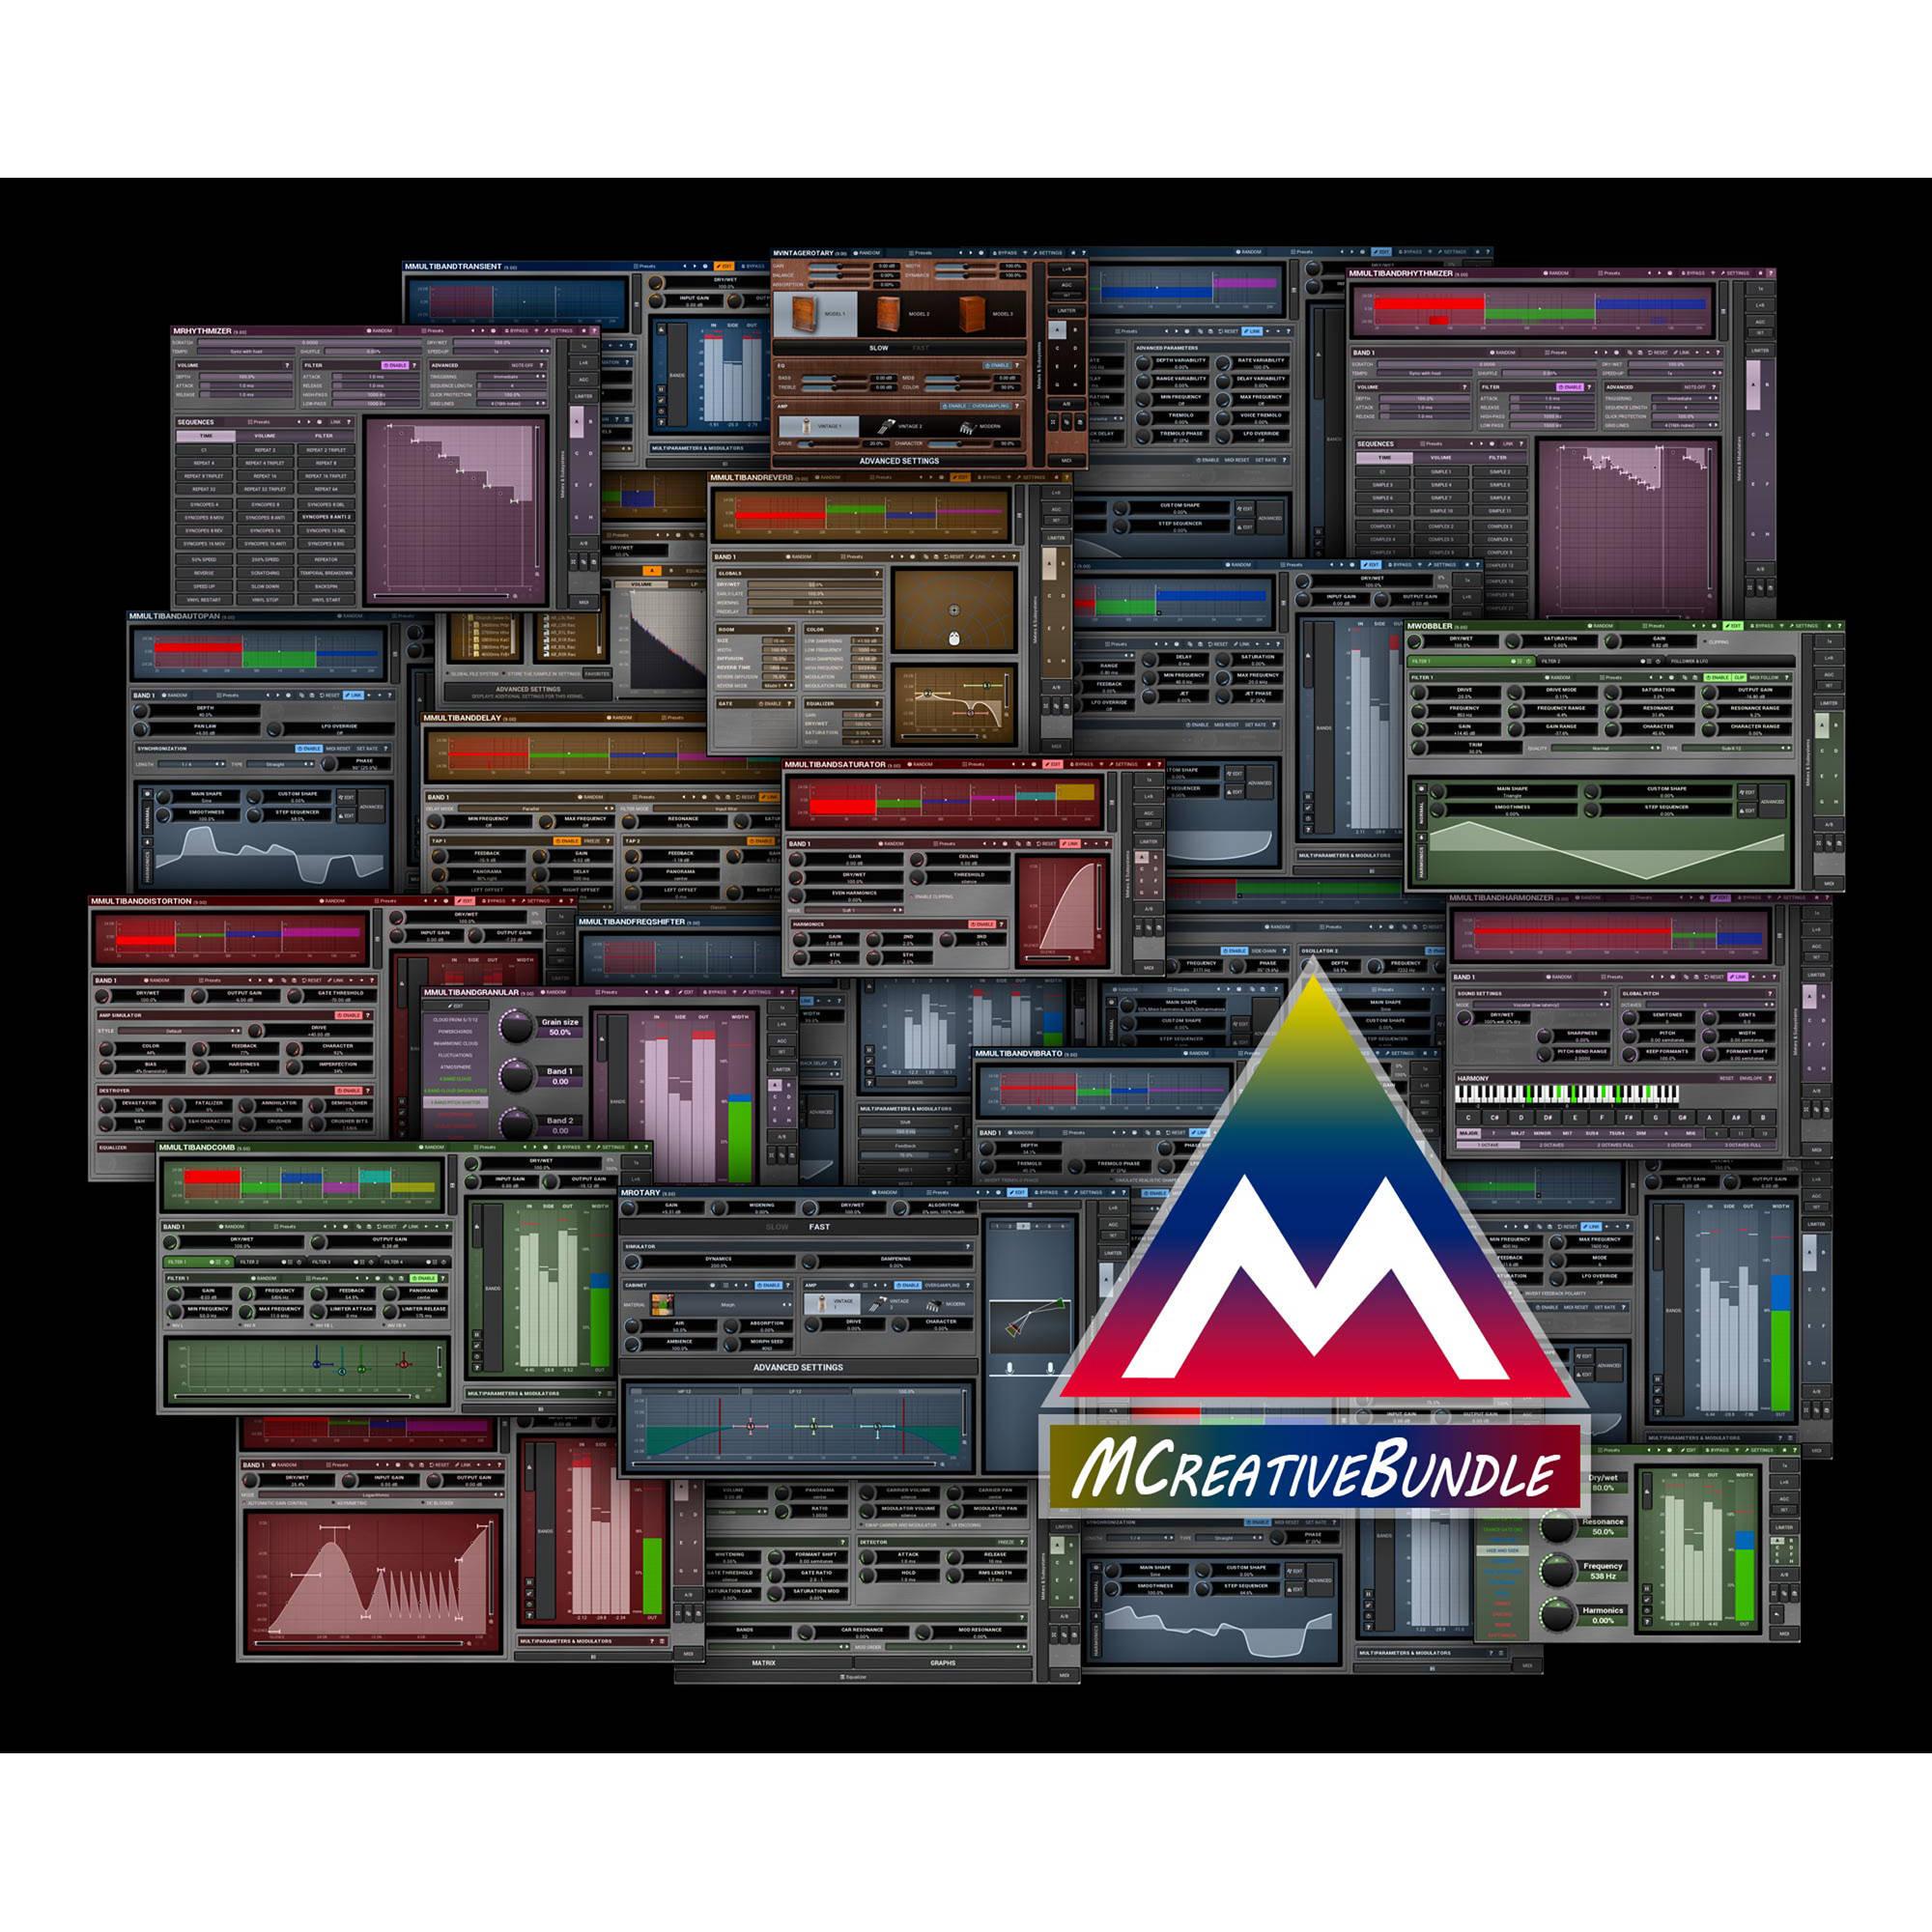 MCreativeBundle - Sound Processing Plug-Ins Bundle (Download)